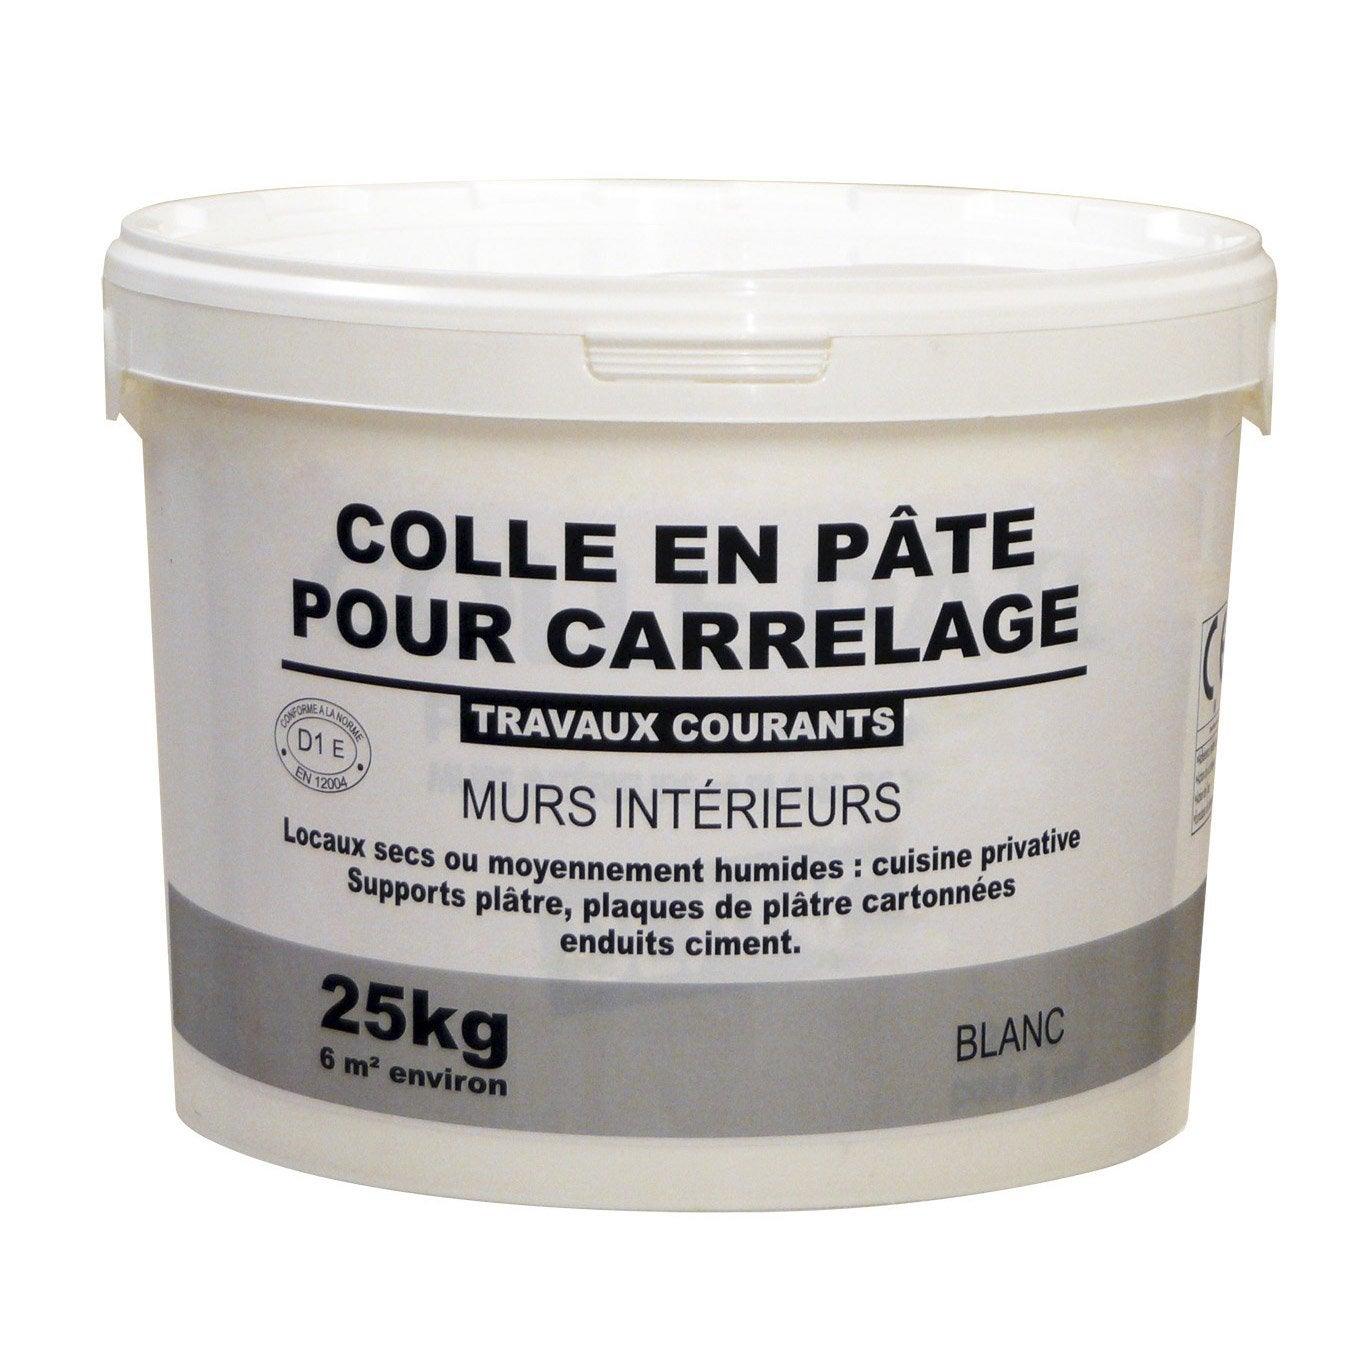 Carrelage 70x30 for Carrelage 70x30